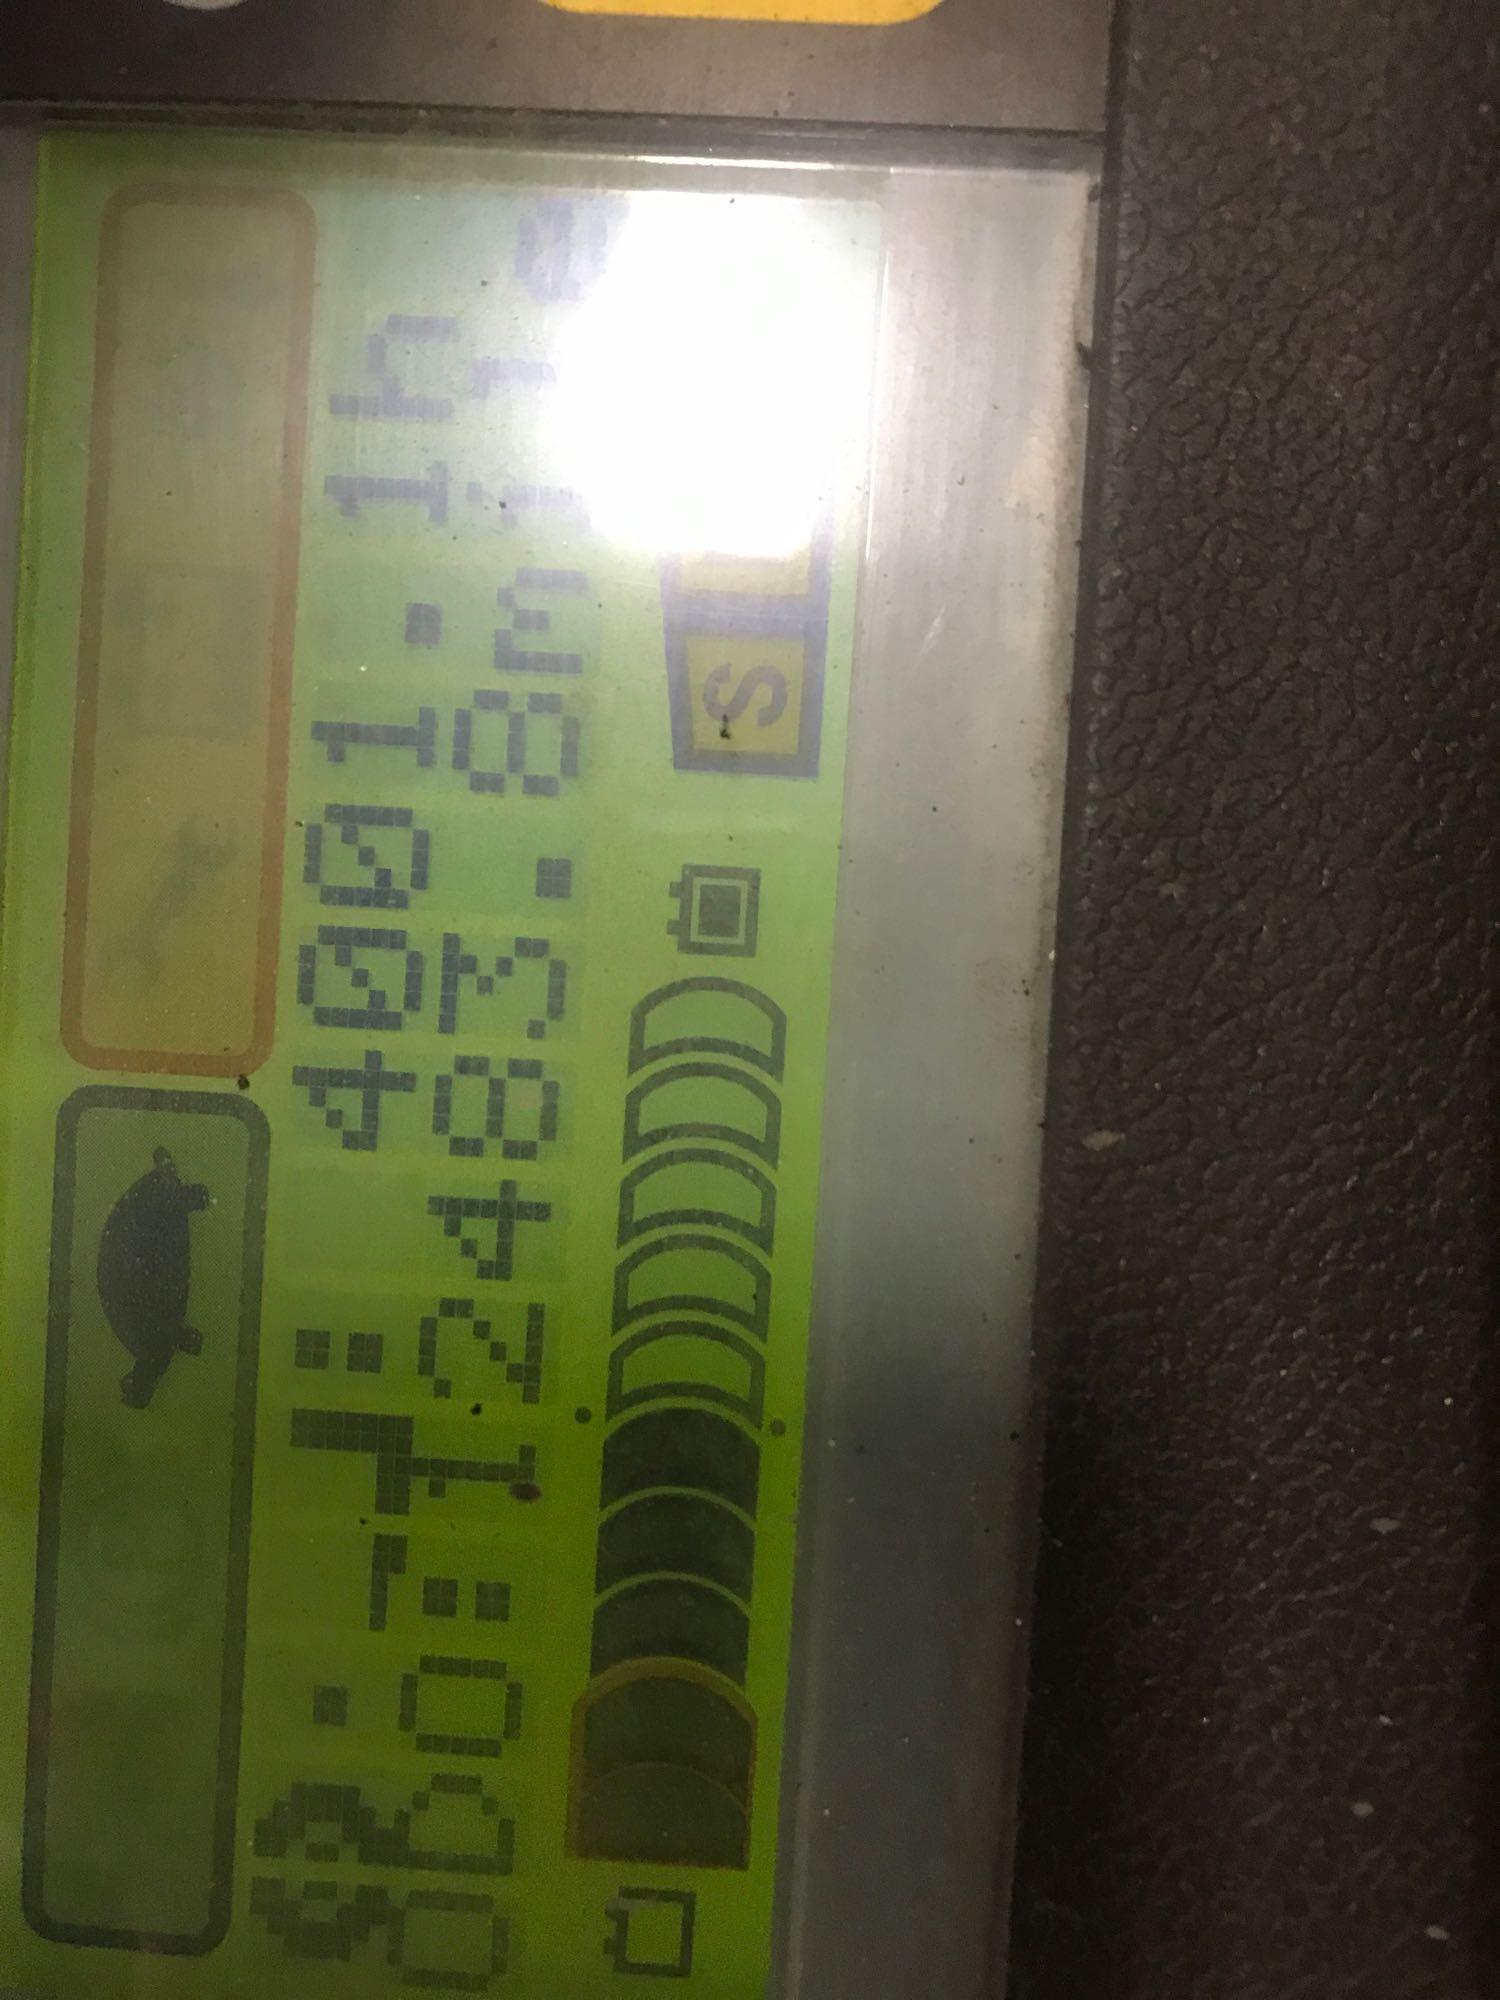 Lot 28 - 2013 TOYOTA 7FBEU15 ELECTRIC FORKLIFT, 3,000 LB LIFT CAPACITY, TILT, SIDE SHIFT, HYDRAULIC FORK POSI